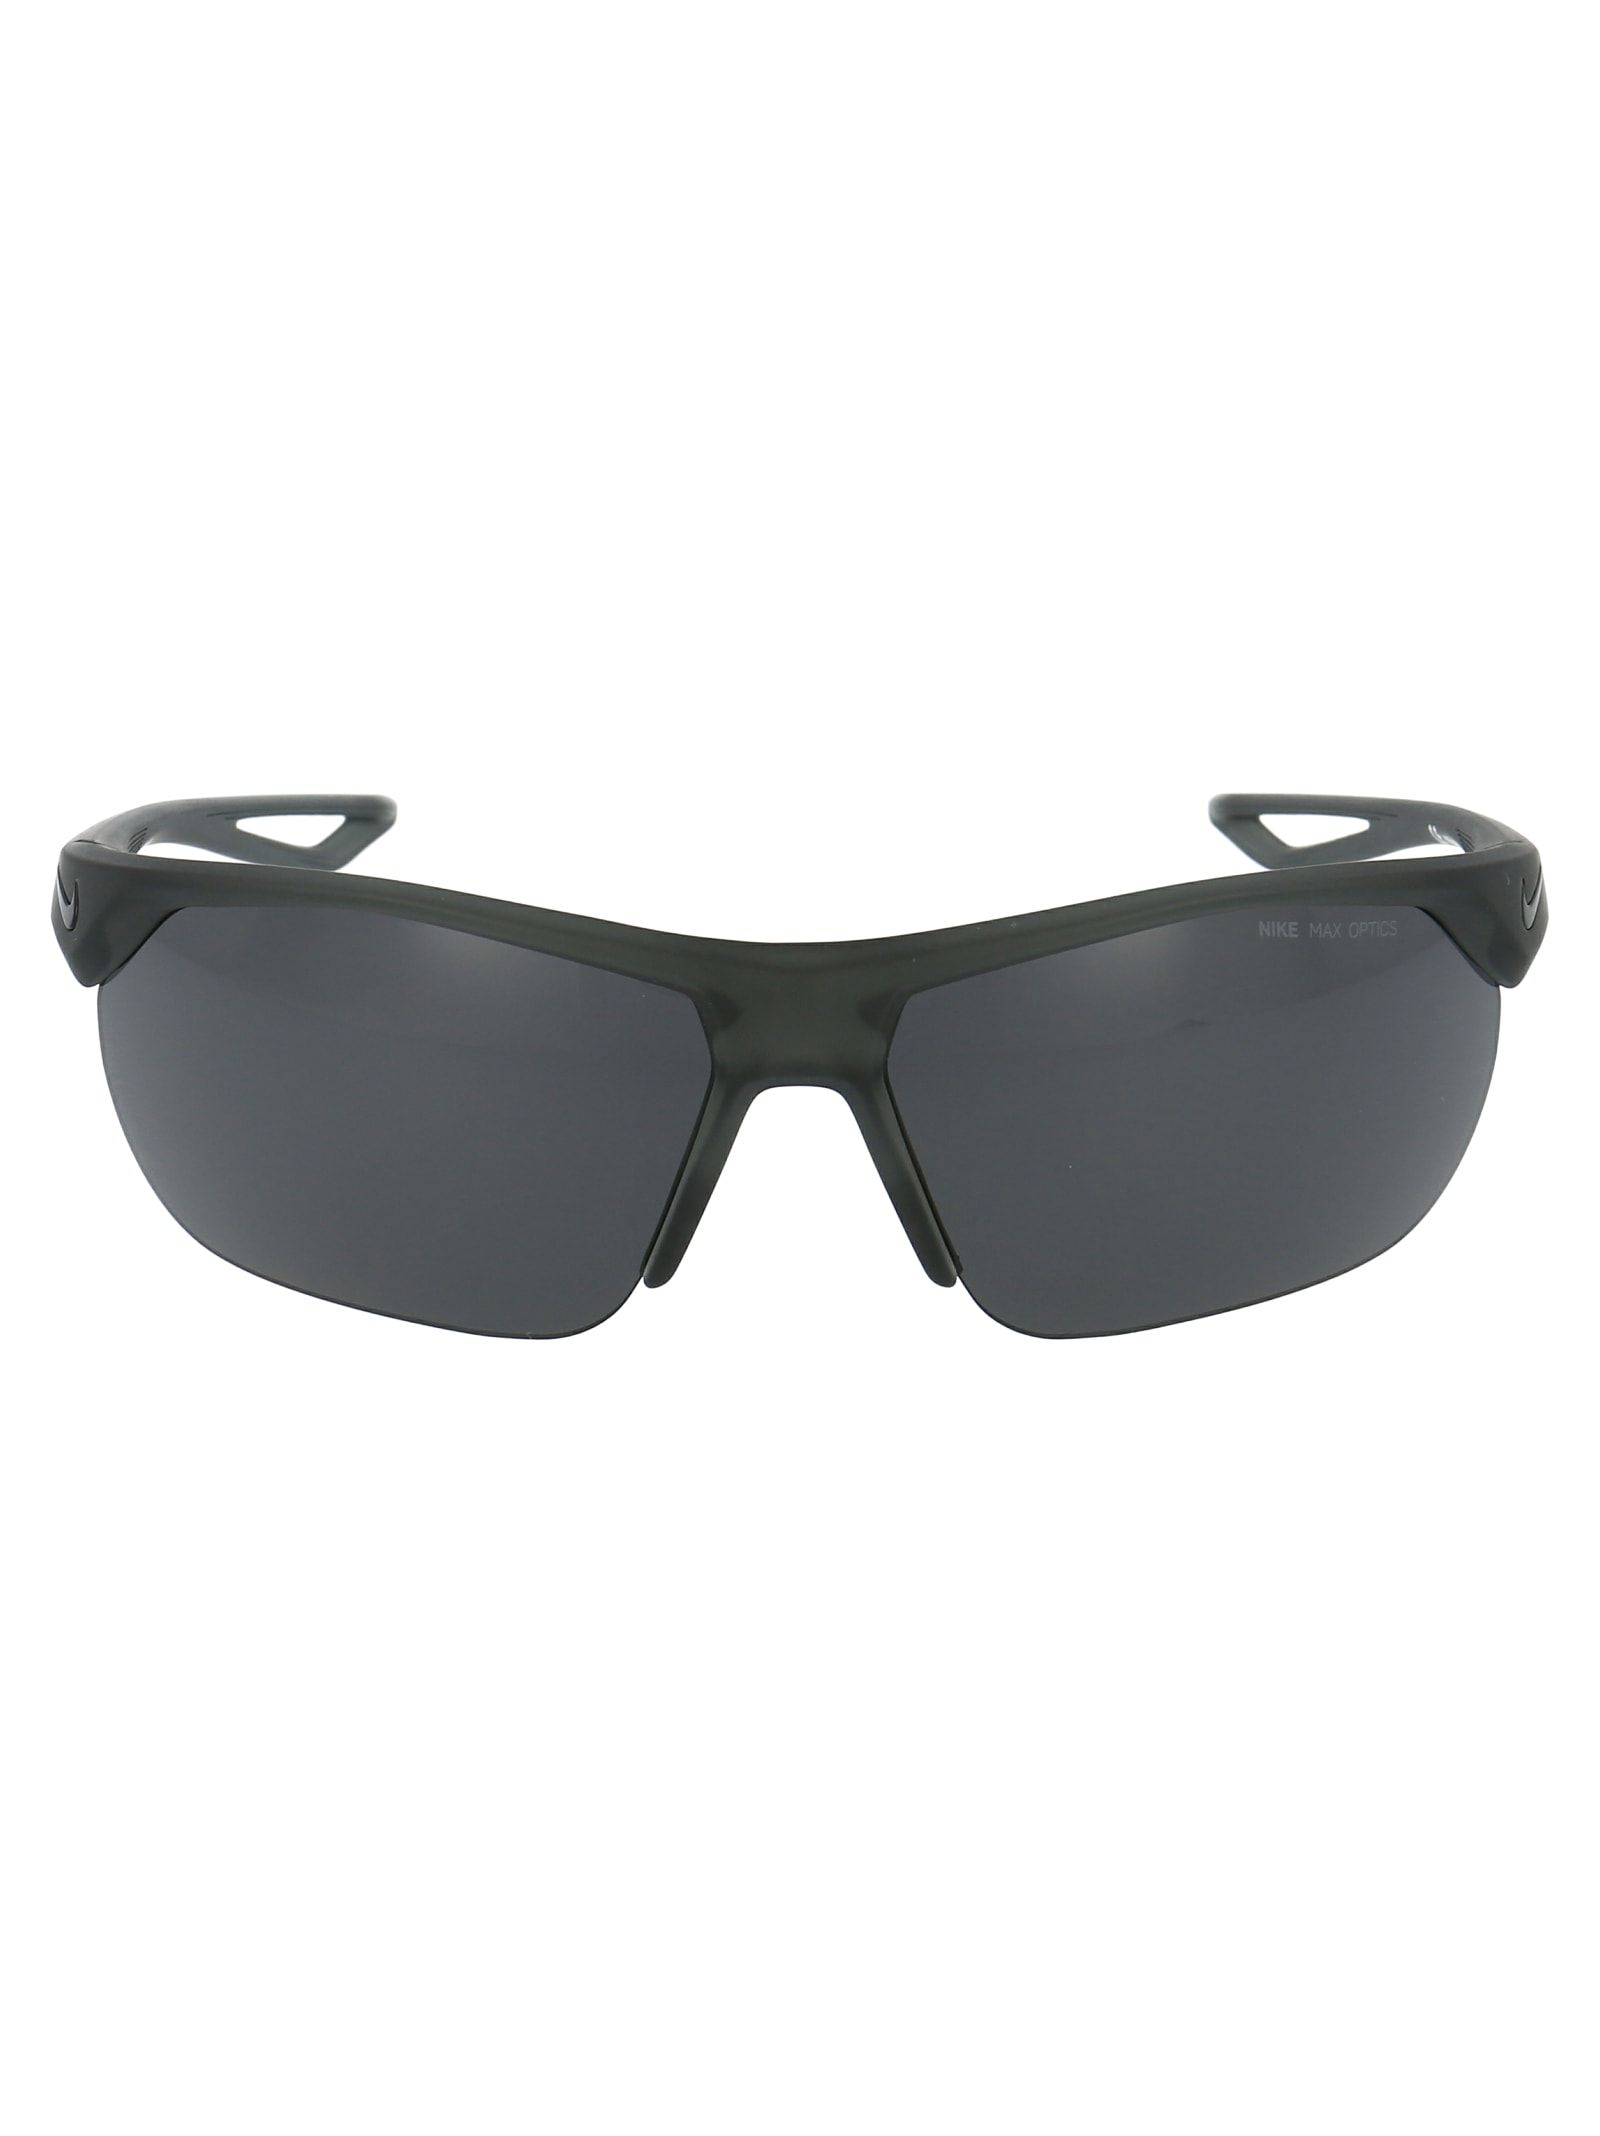 NIKE SUNGLASSES. nike Sunglasses, Nike, Nike accessories